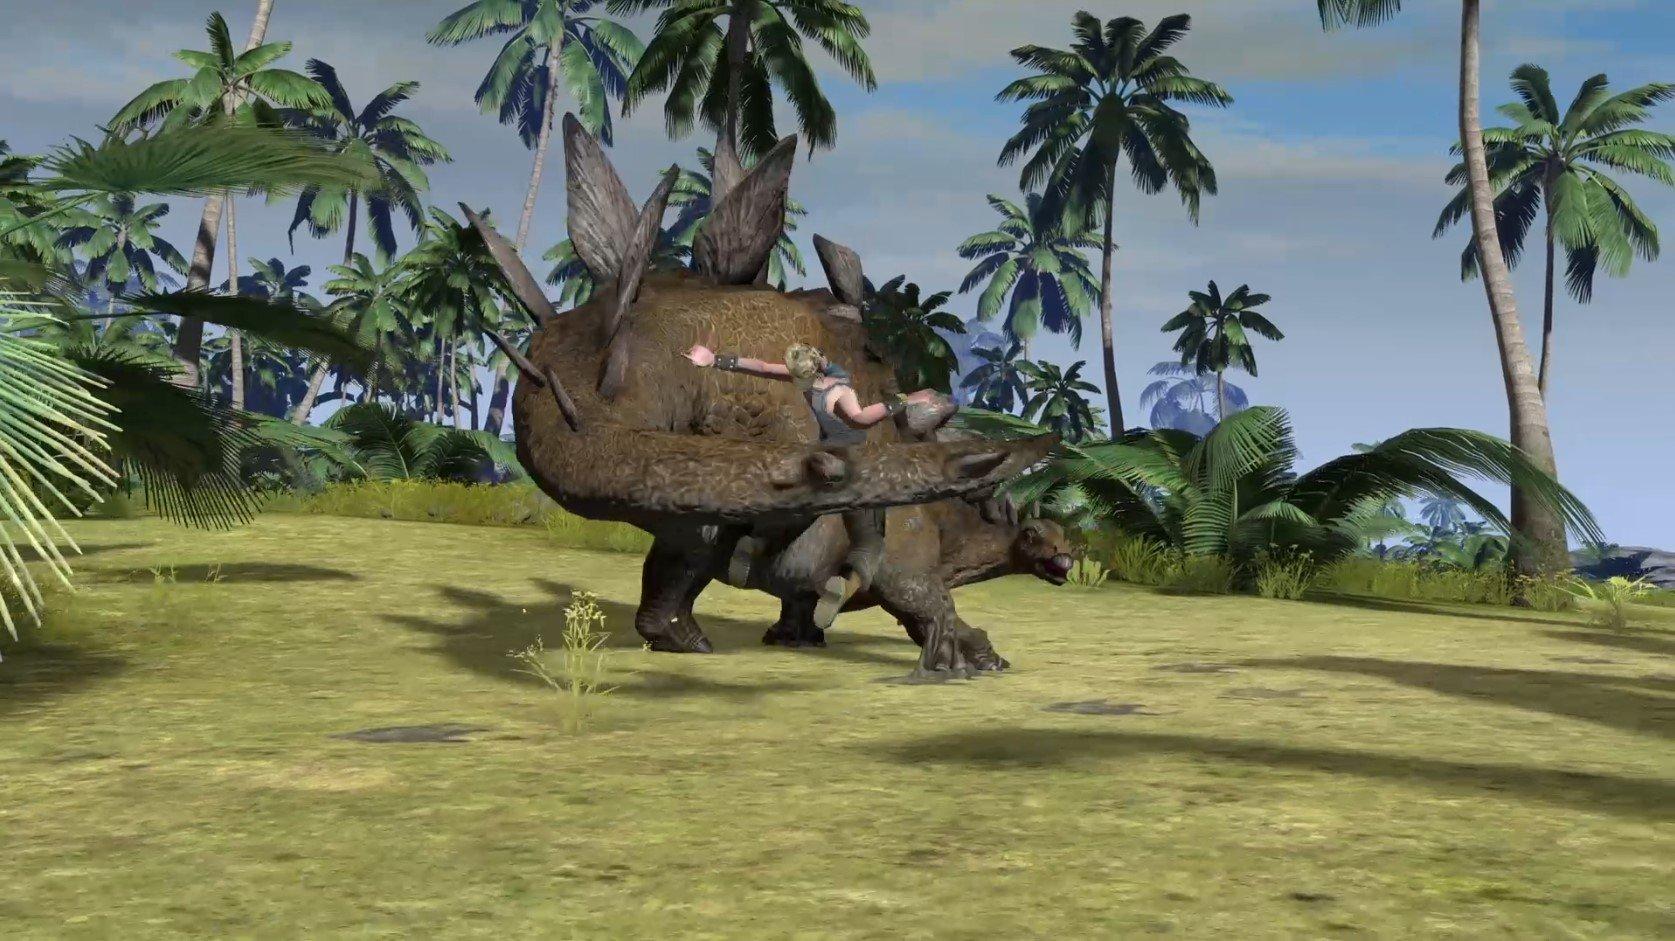 Carnivores-Dinosaur-Hunt-Gameplay-Stegosaure-Mort